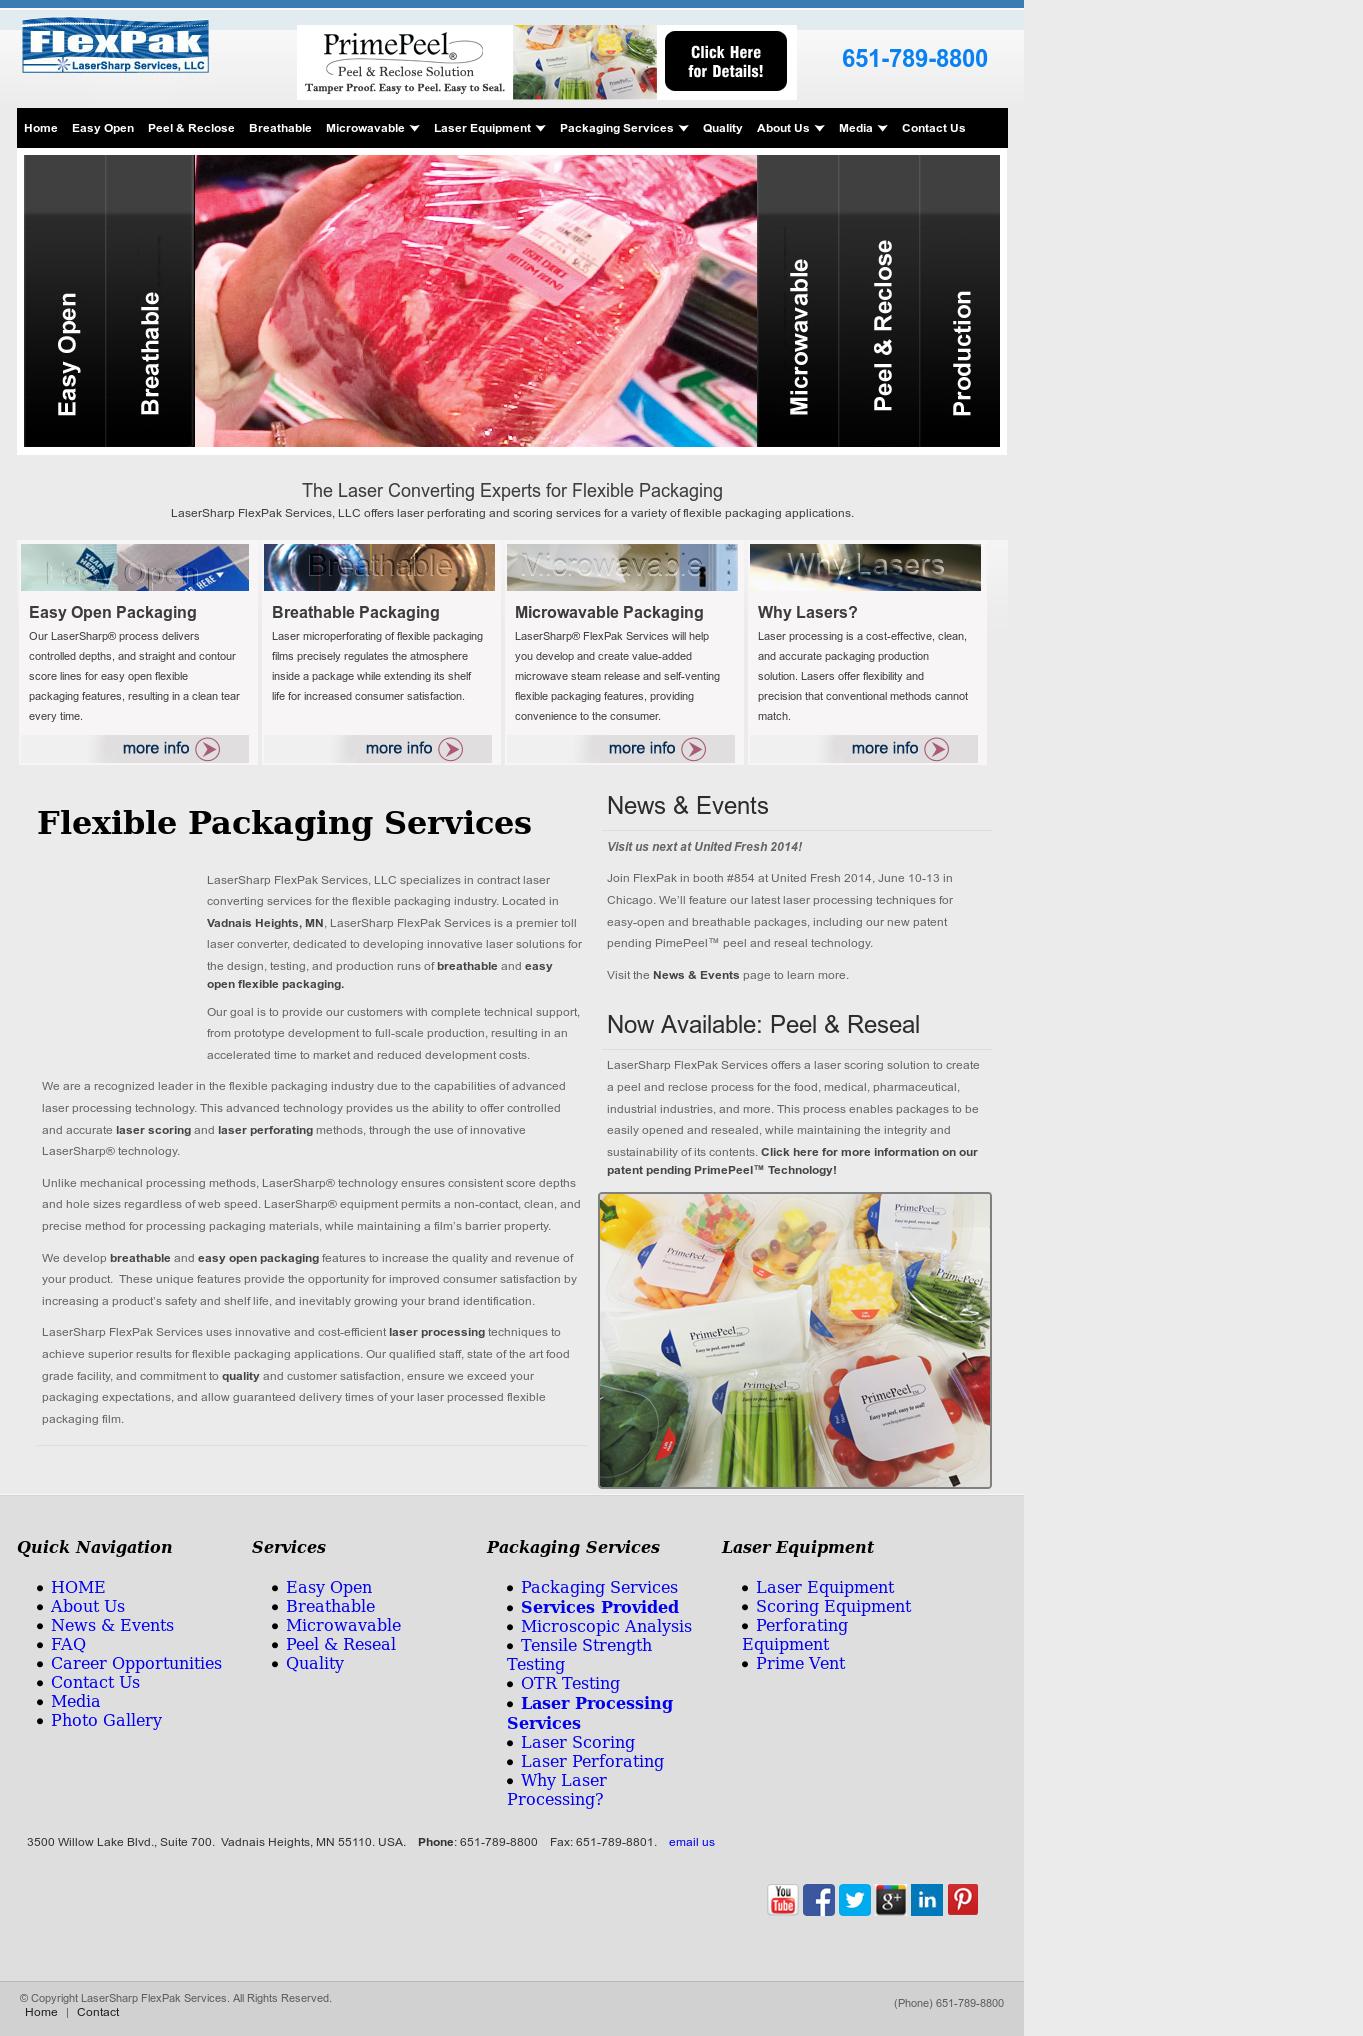 LaserSharp FlexPak Services Competitors, Revenue and